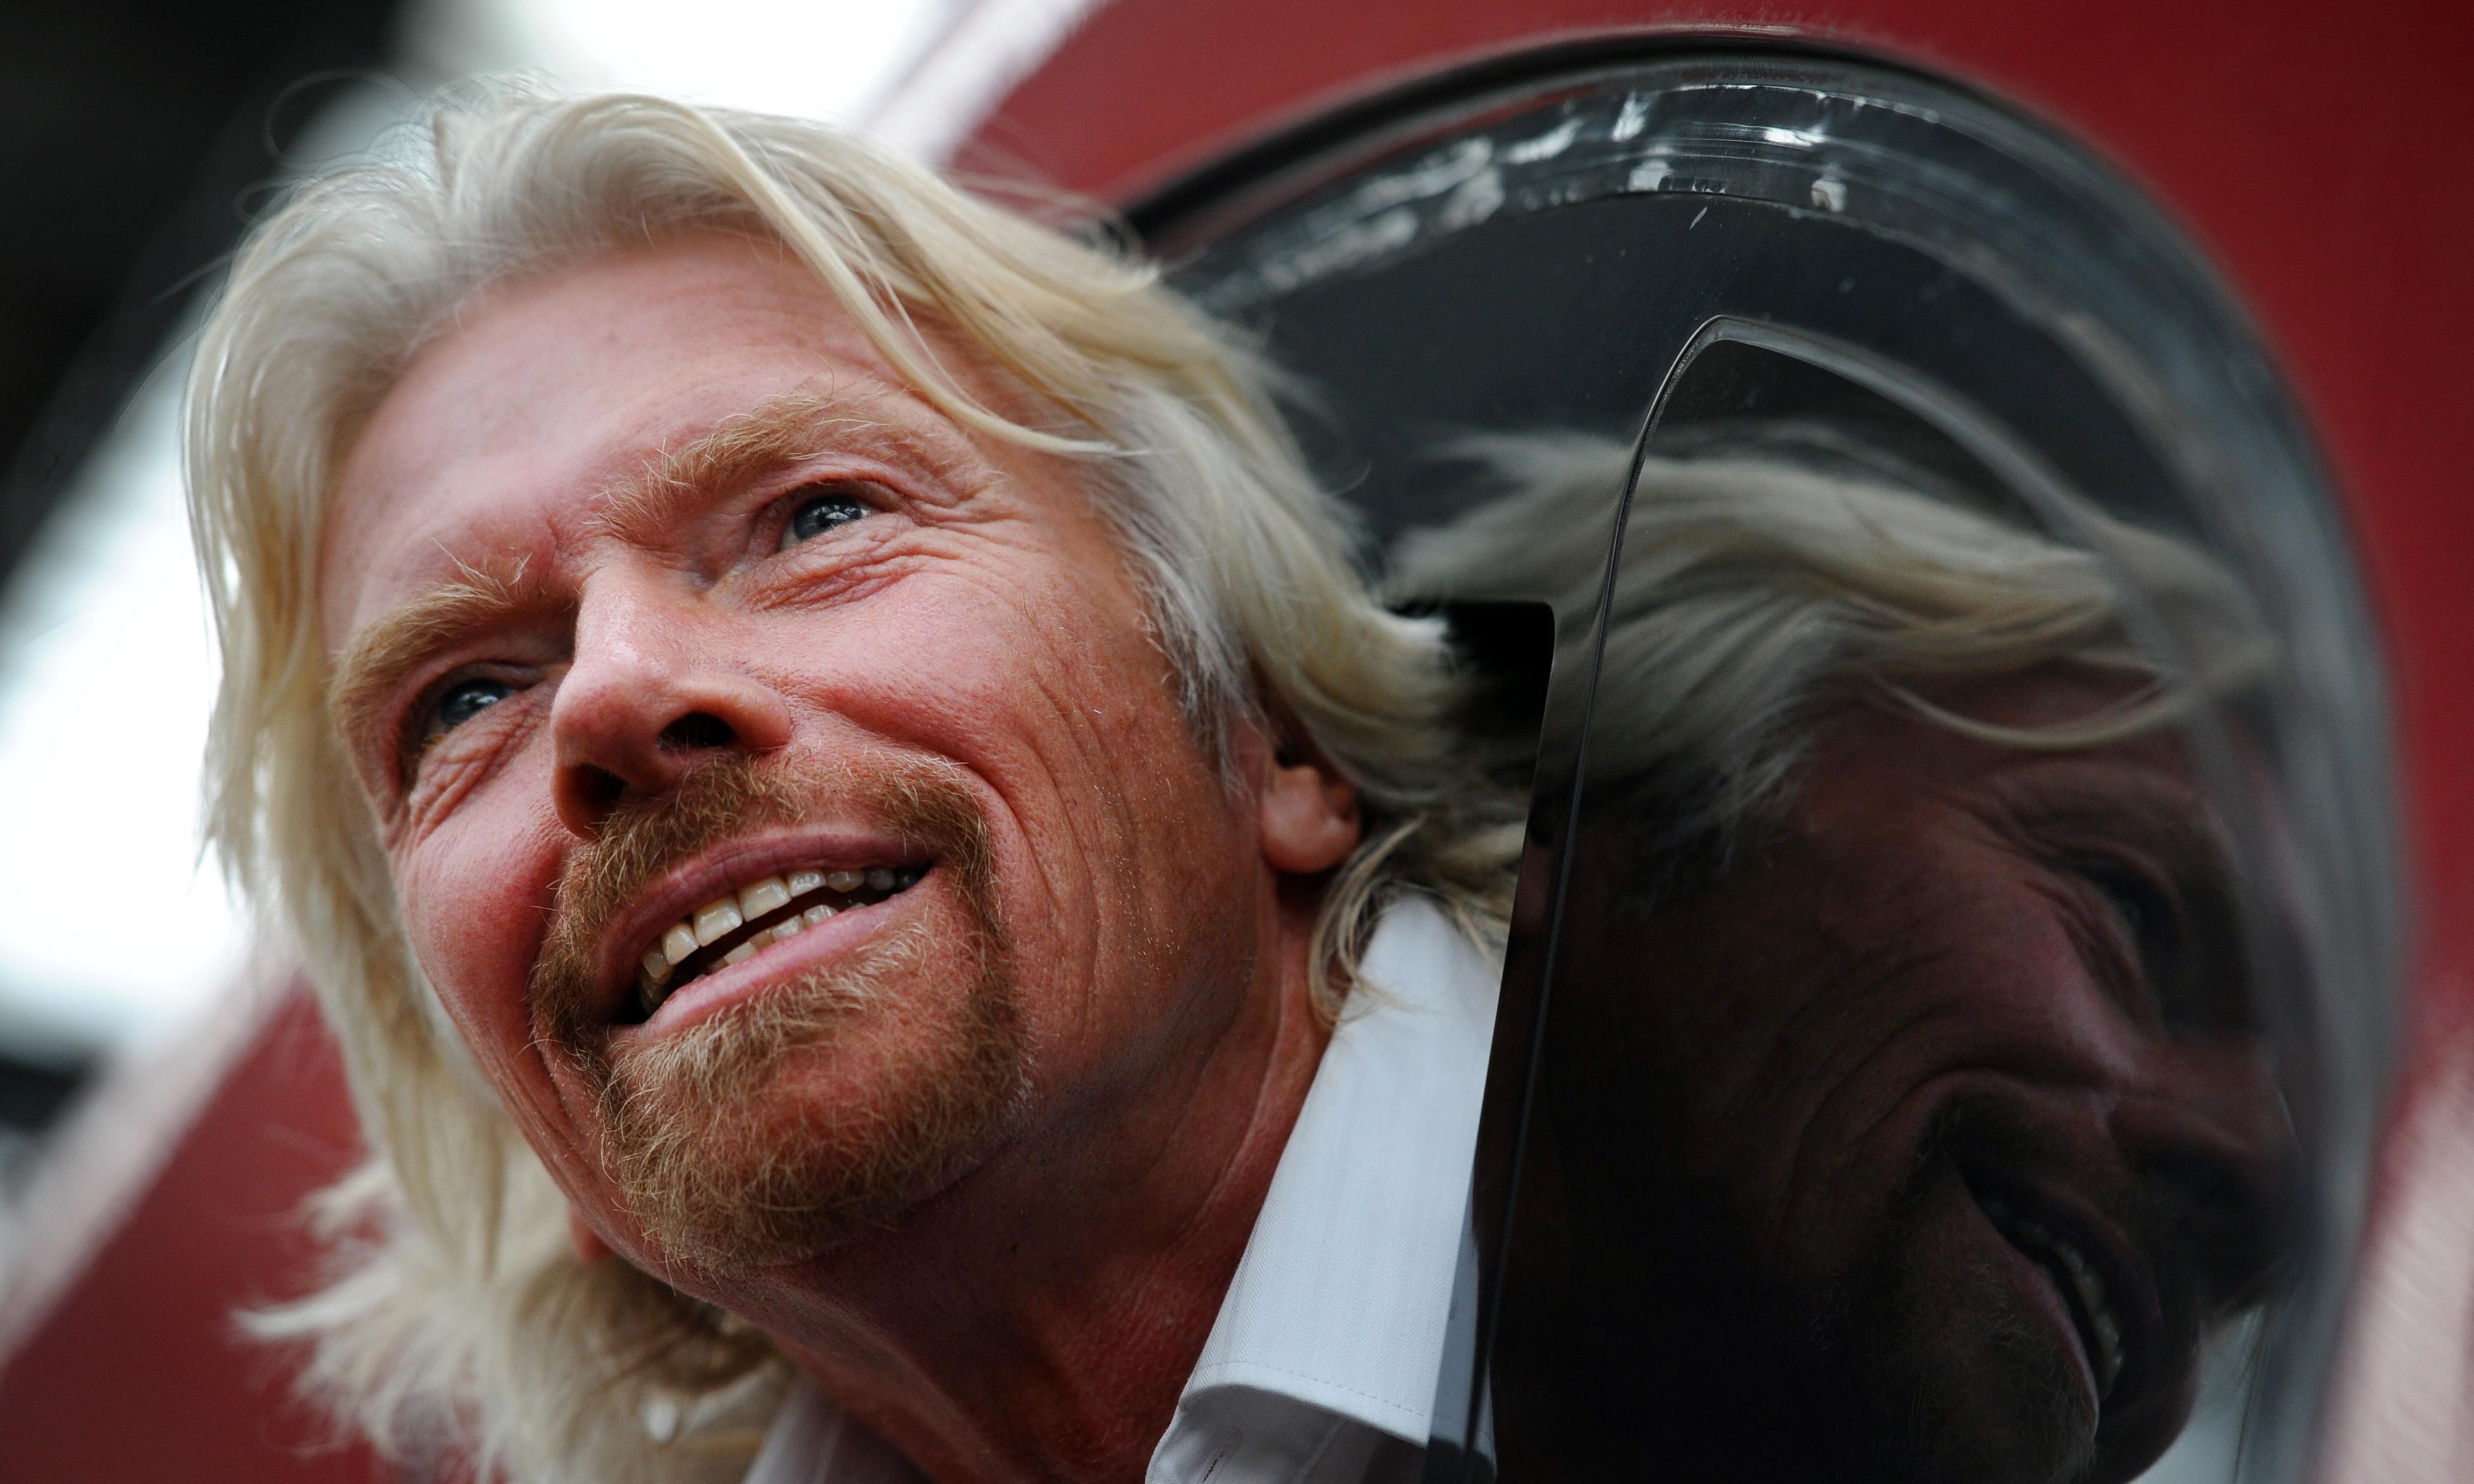 Virgin Trains and avoiding chaos